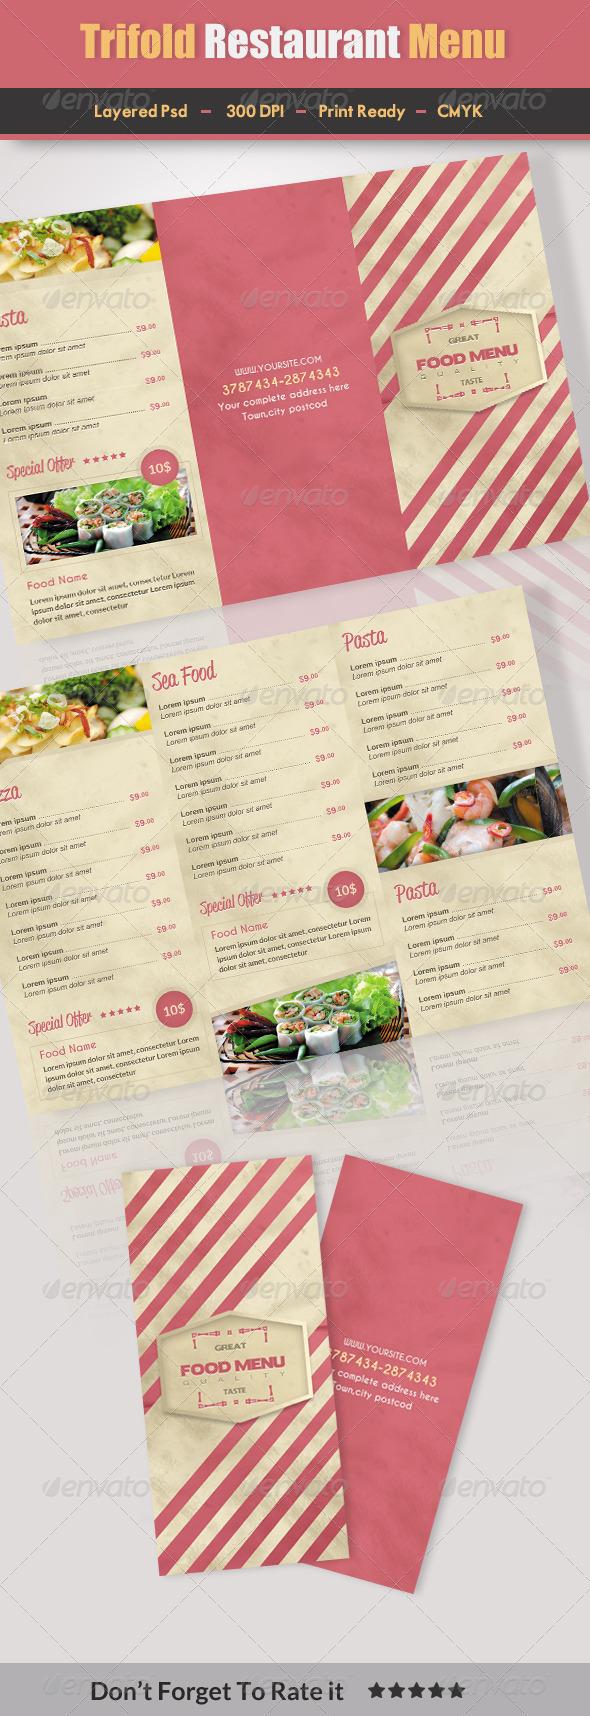 Trifold Restaurant Menu 2 - Food Menus Print Templates